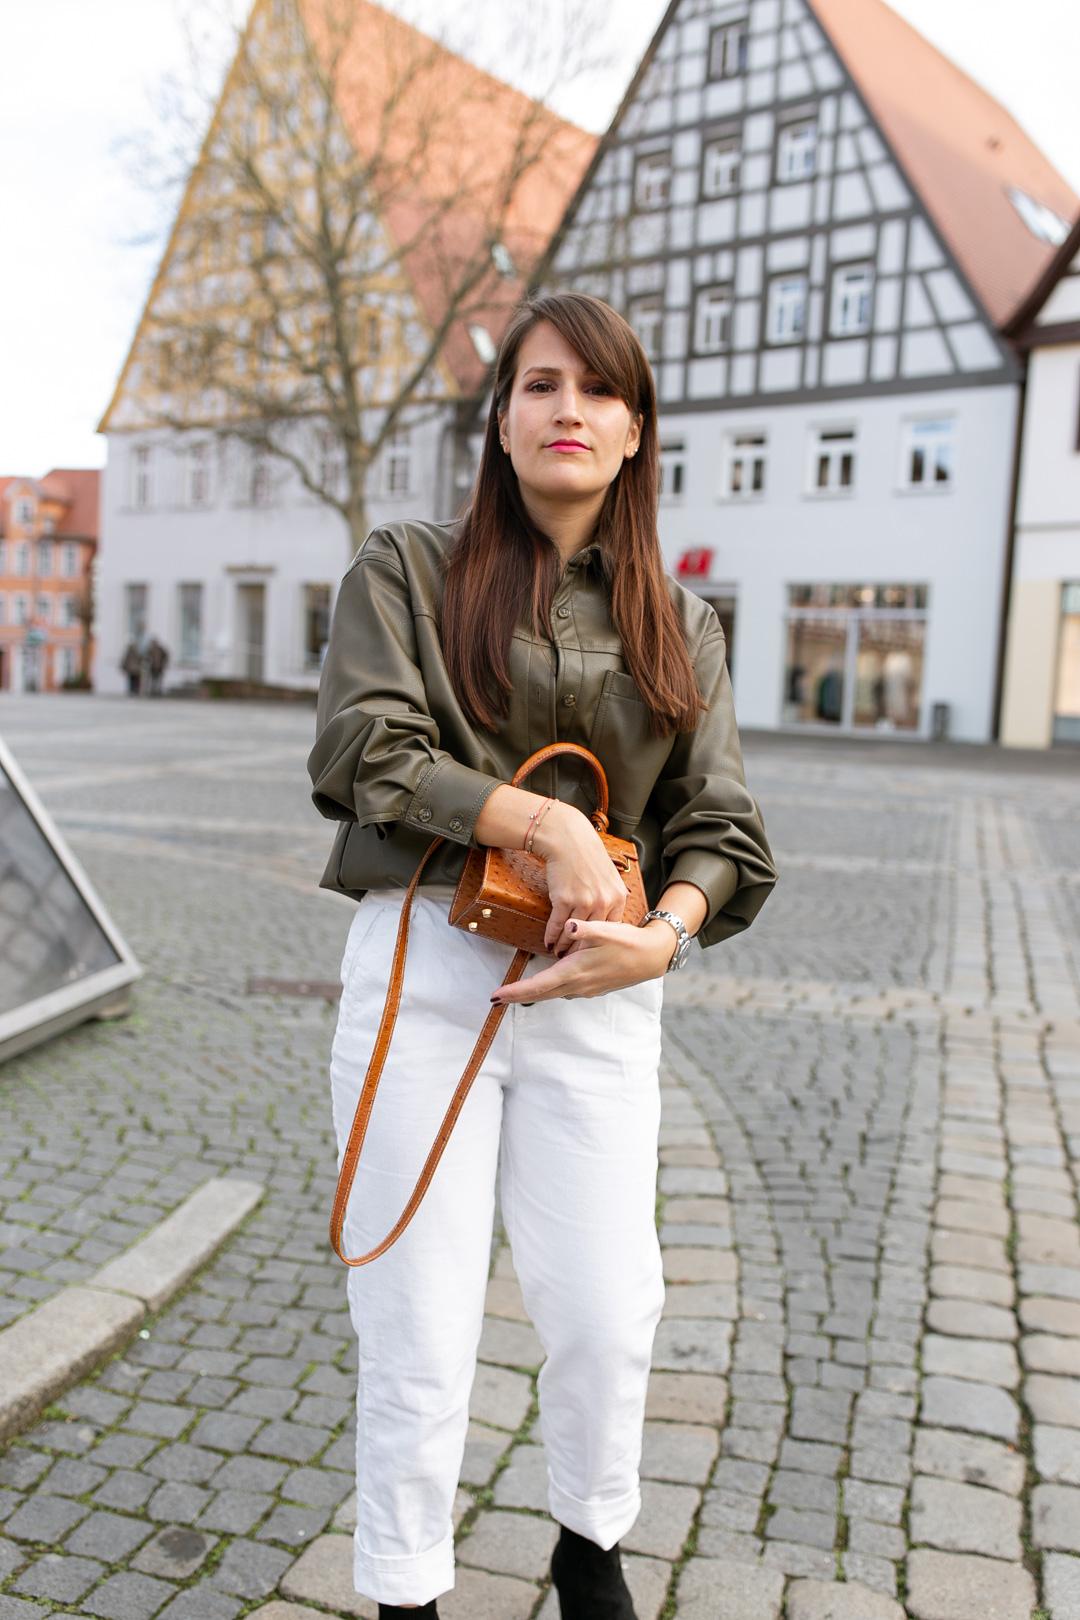 Shacket aus Leder - Pieces of Mariposa / Fashion & Lifestyle Blog aus Nürnberg